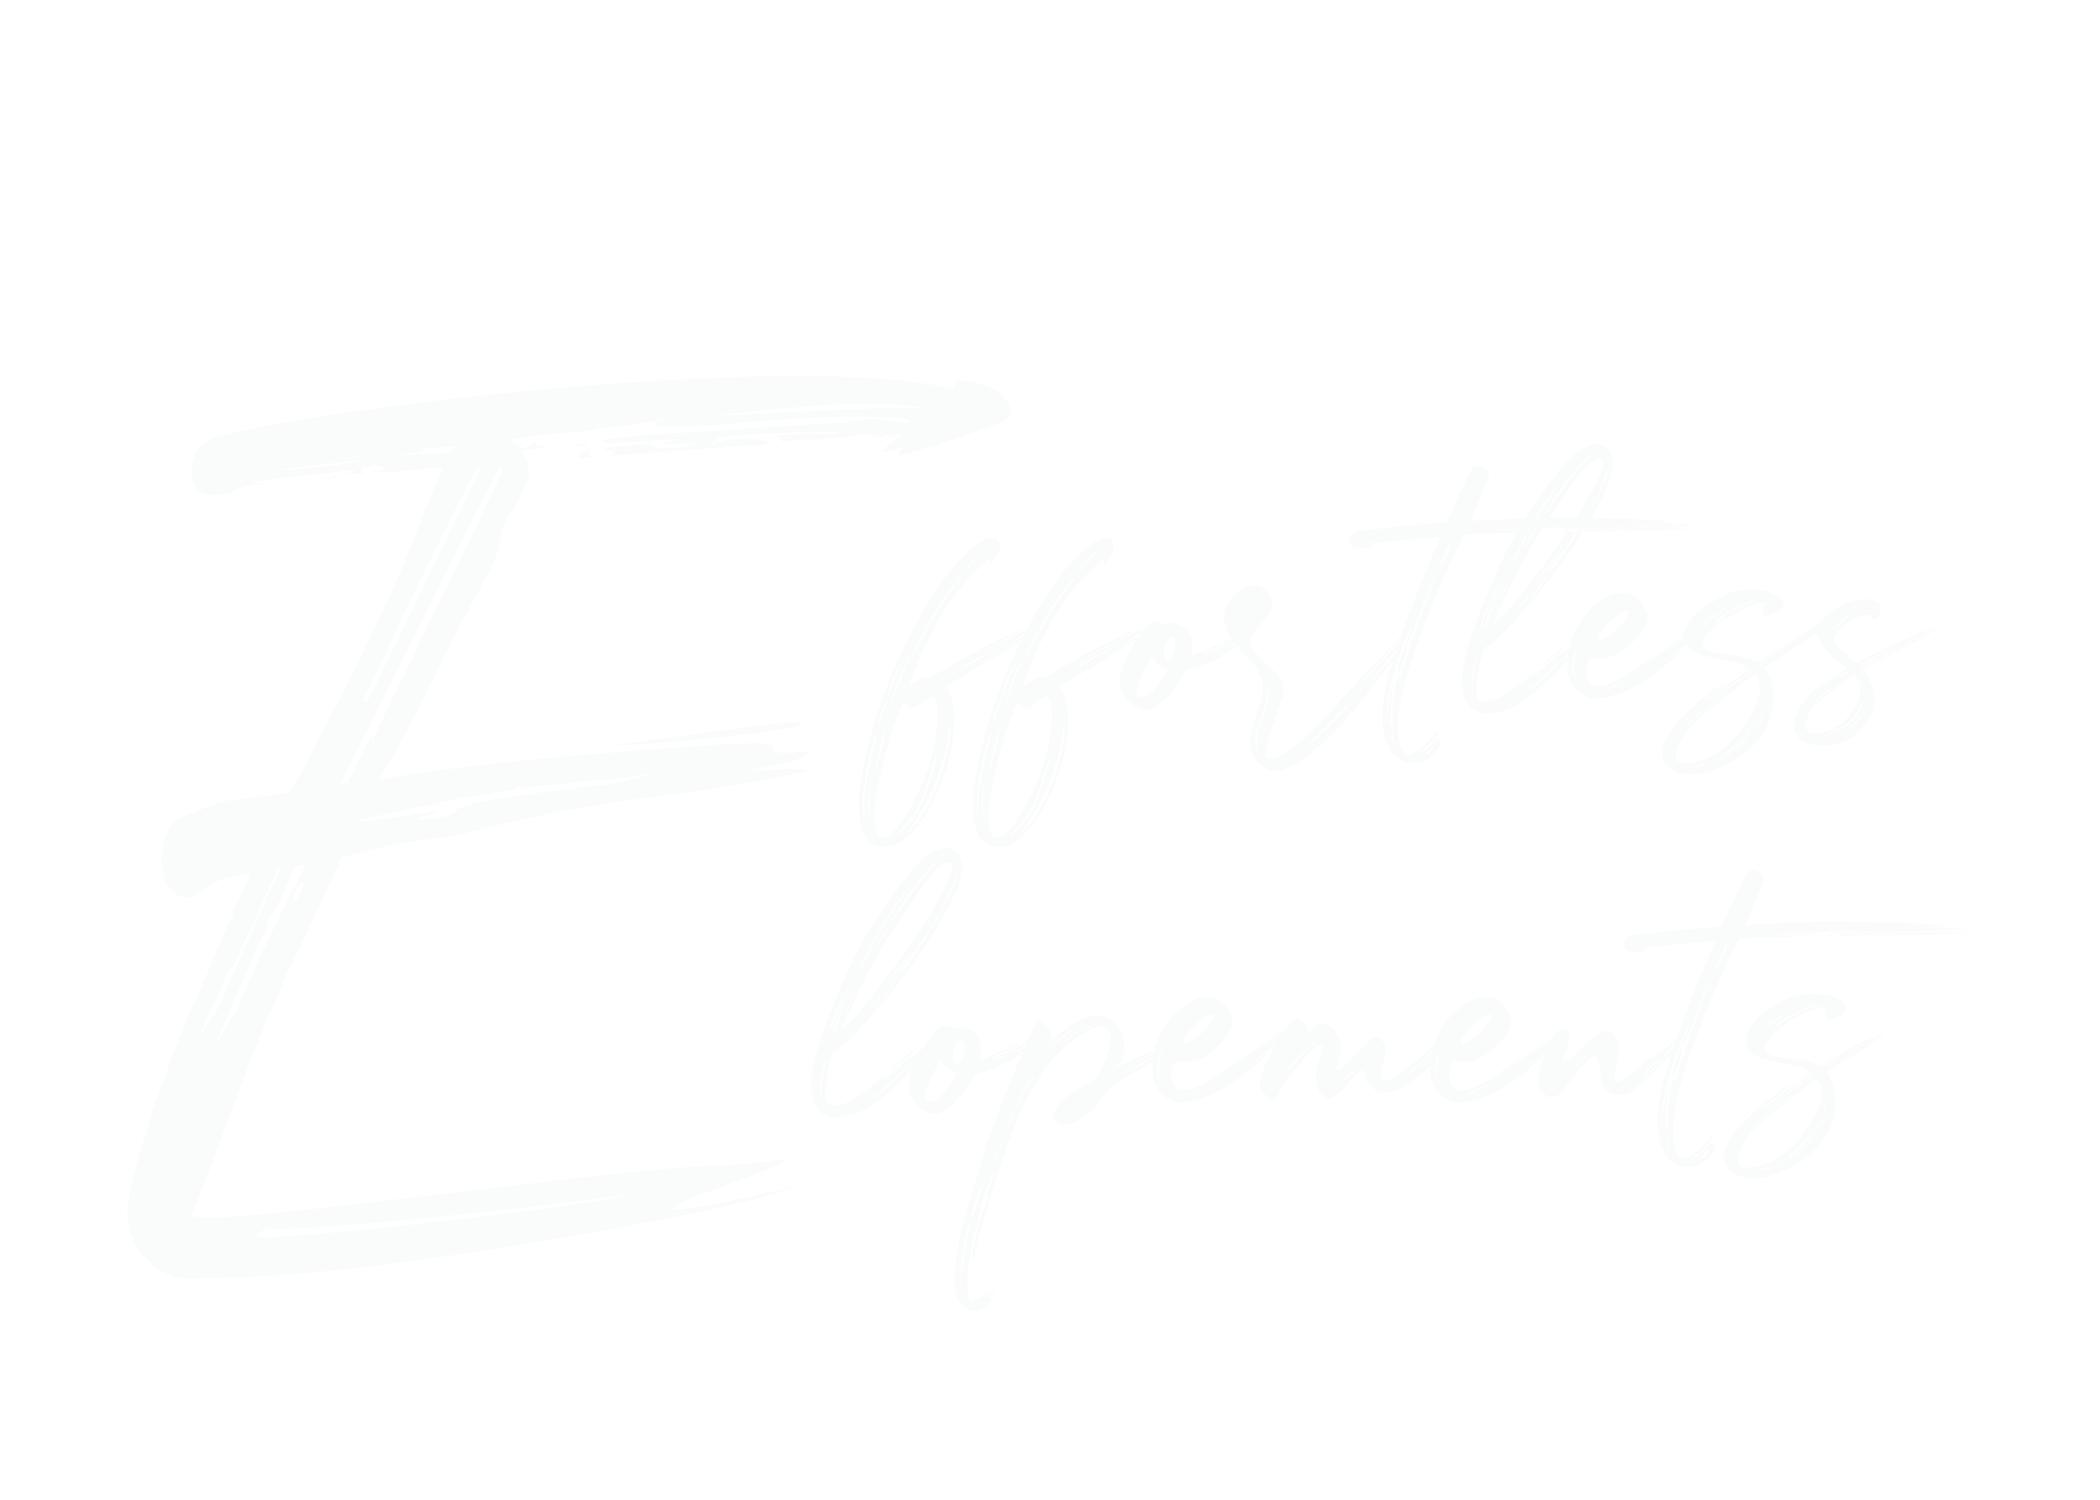 eff-it-white.png